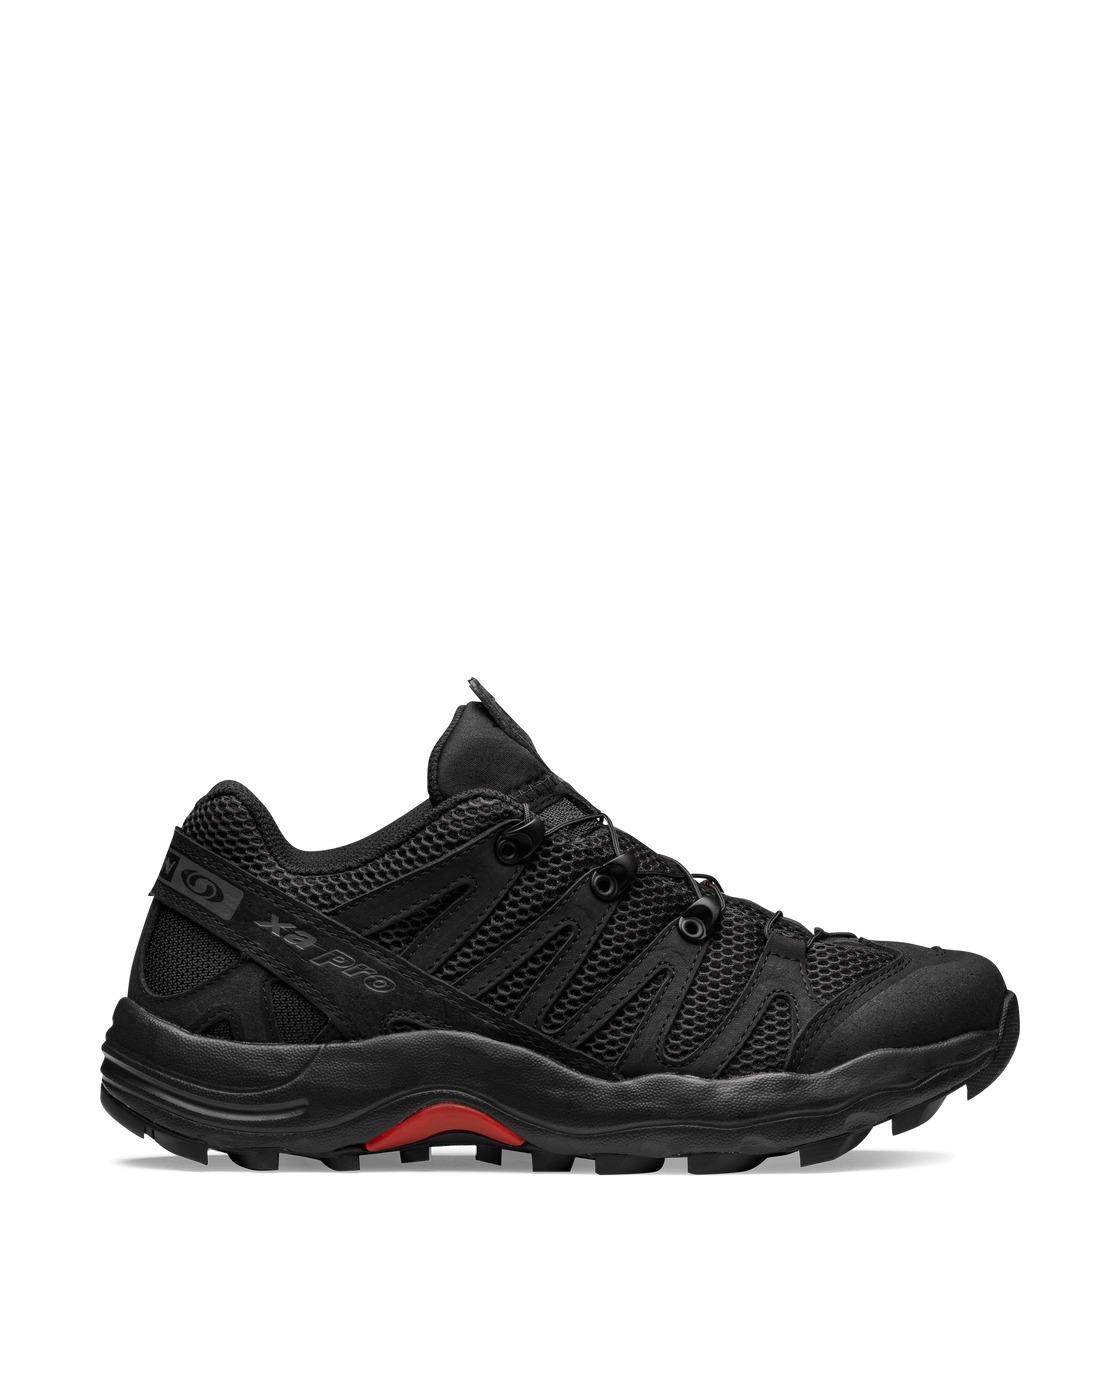 Photo: Salomon Organiclab.Zip Xa Pro 1 Sneakers Black/Mavk